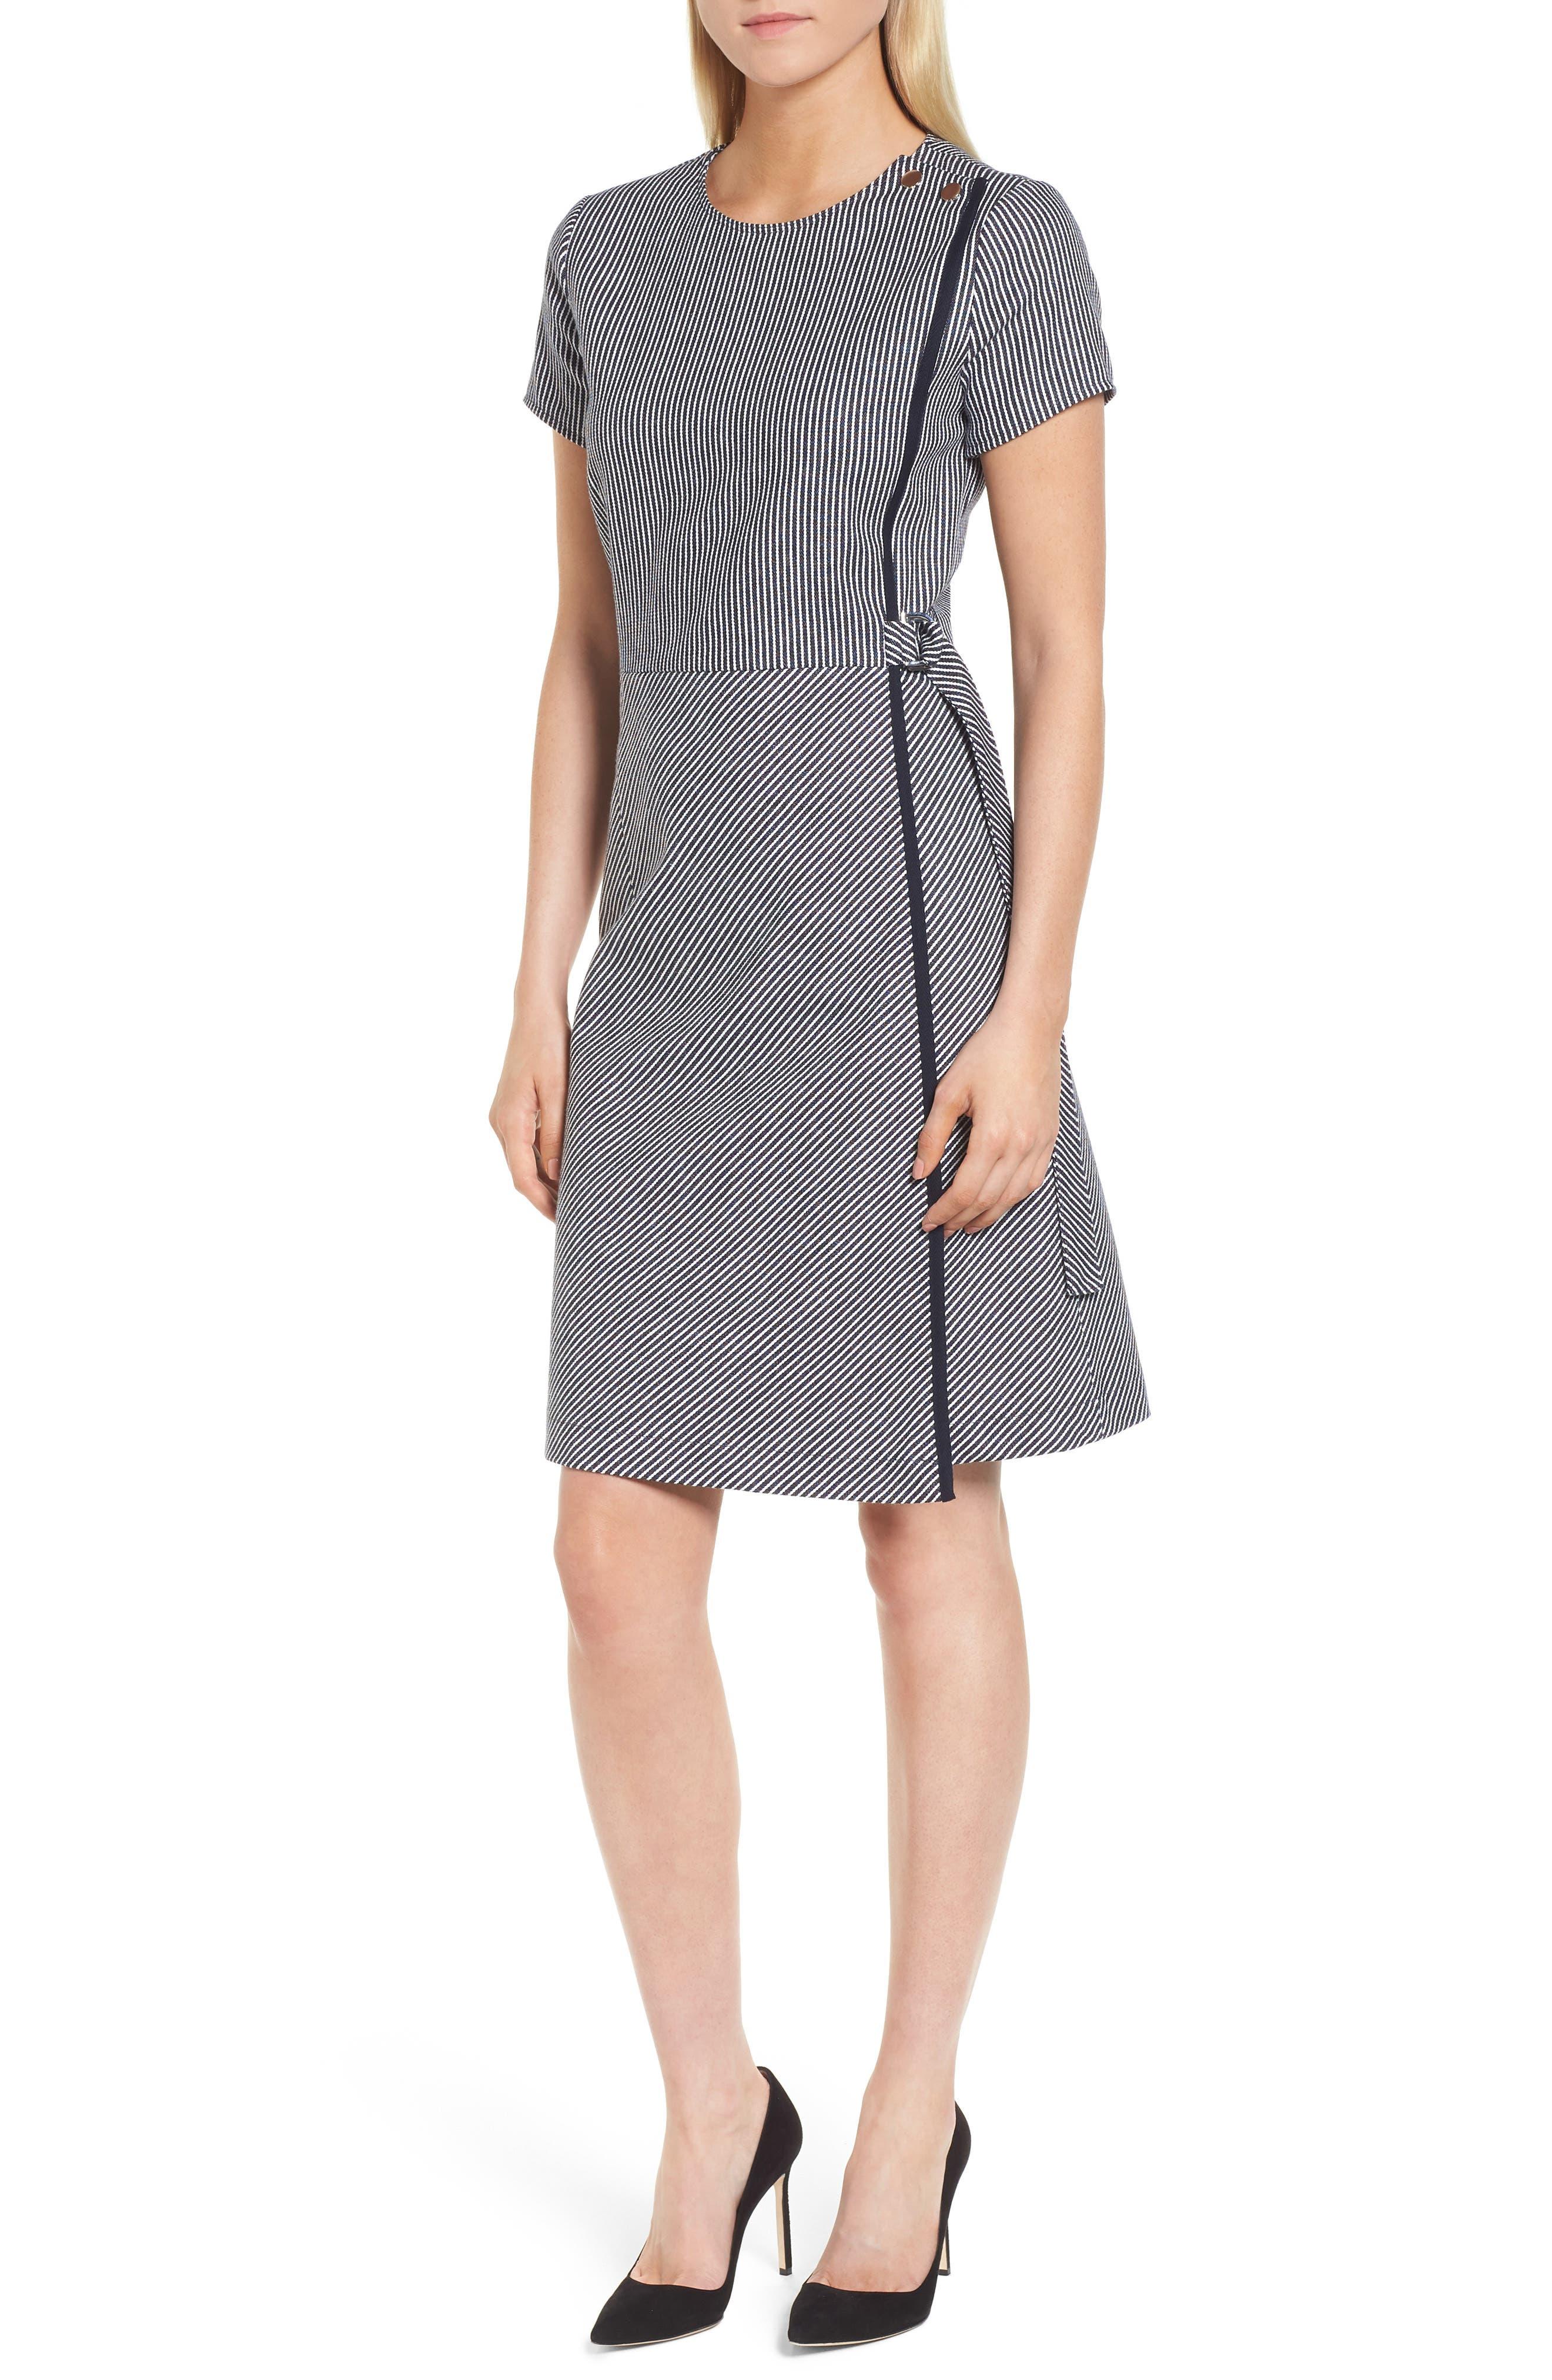 Hugo Boss Hadiana Dress,                             Main thumbnail 1, color,                             461